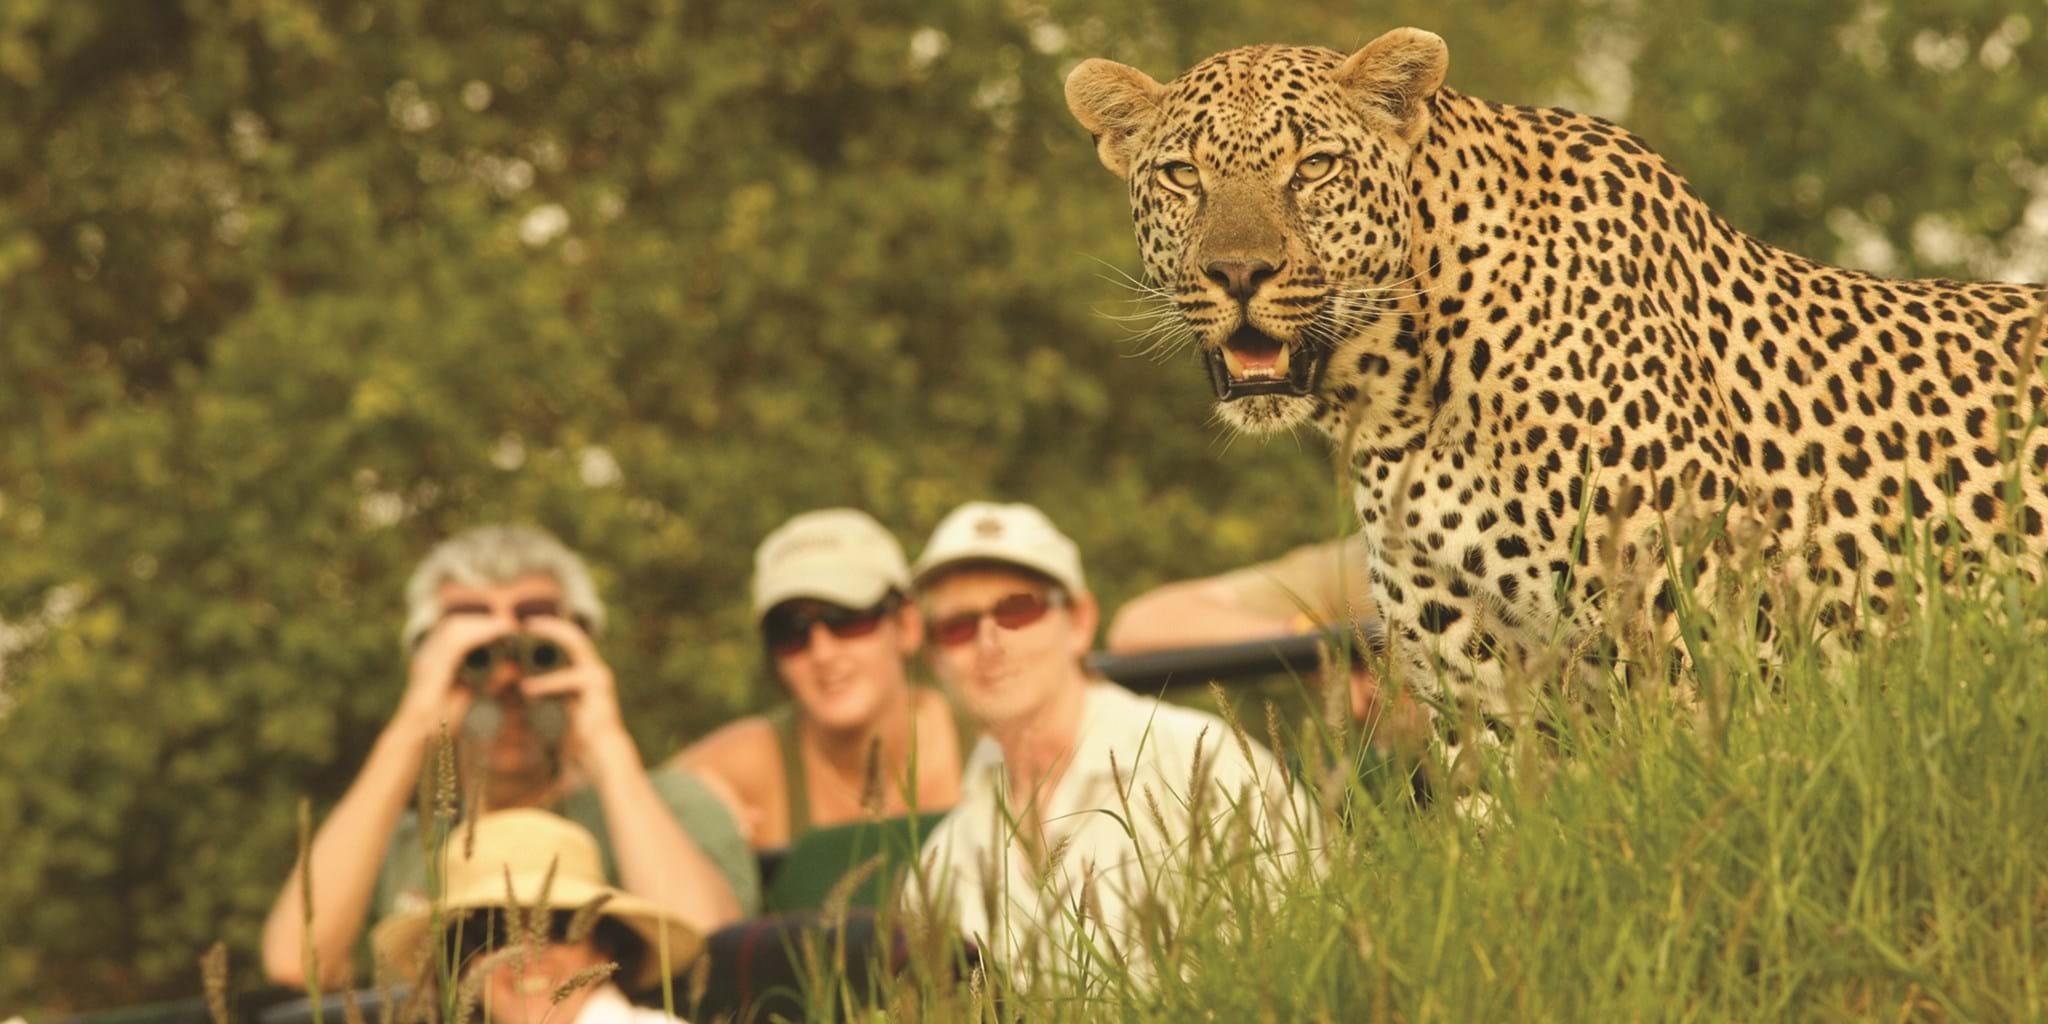 Best Africa Safari Destinations to Visit | Yellow Zebra Safaris